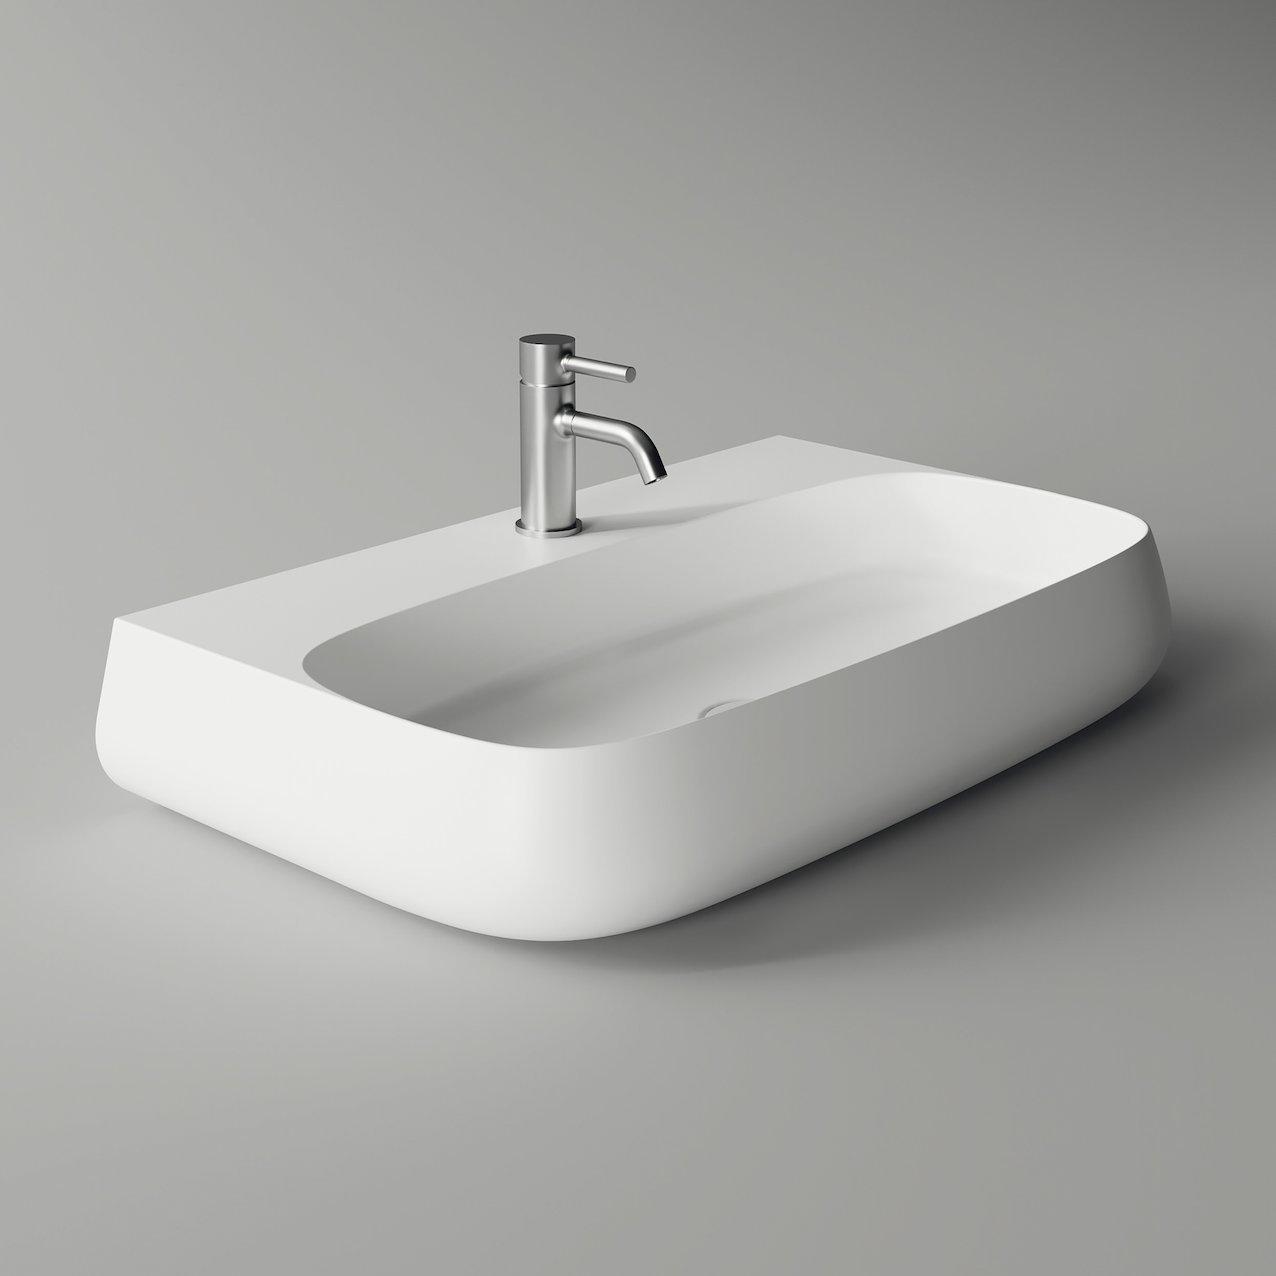 Lavabo NUR 75x45 cm